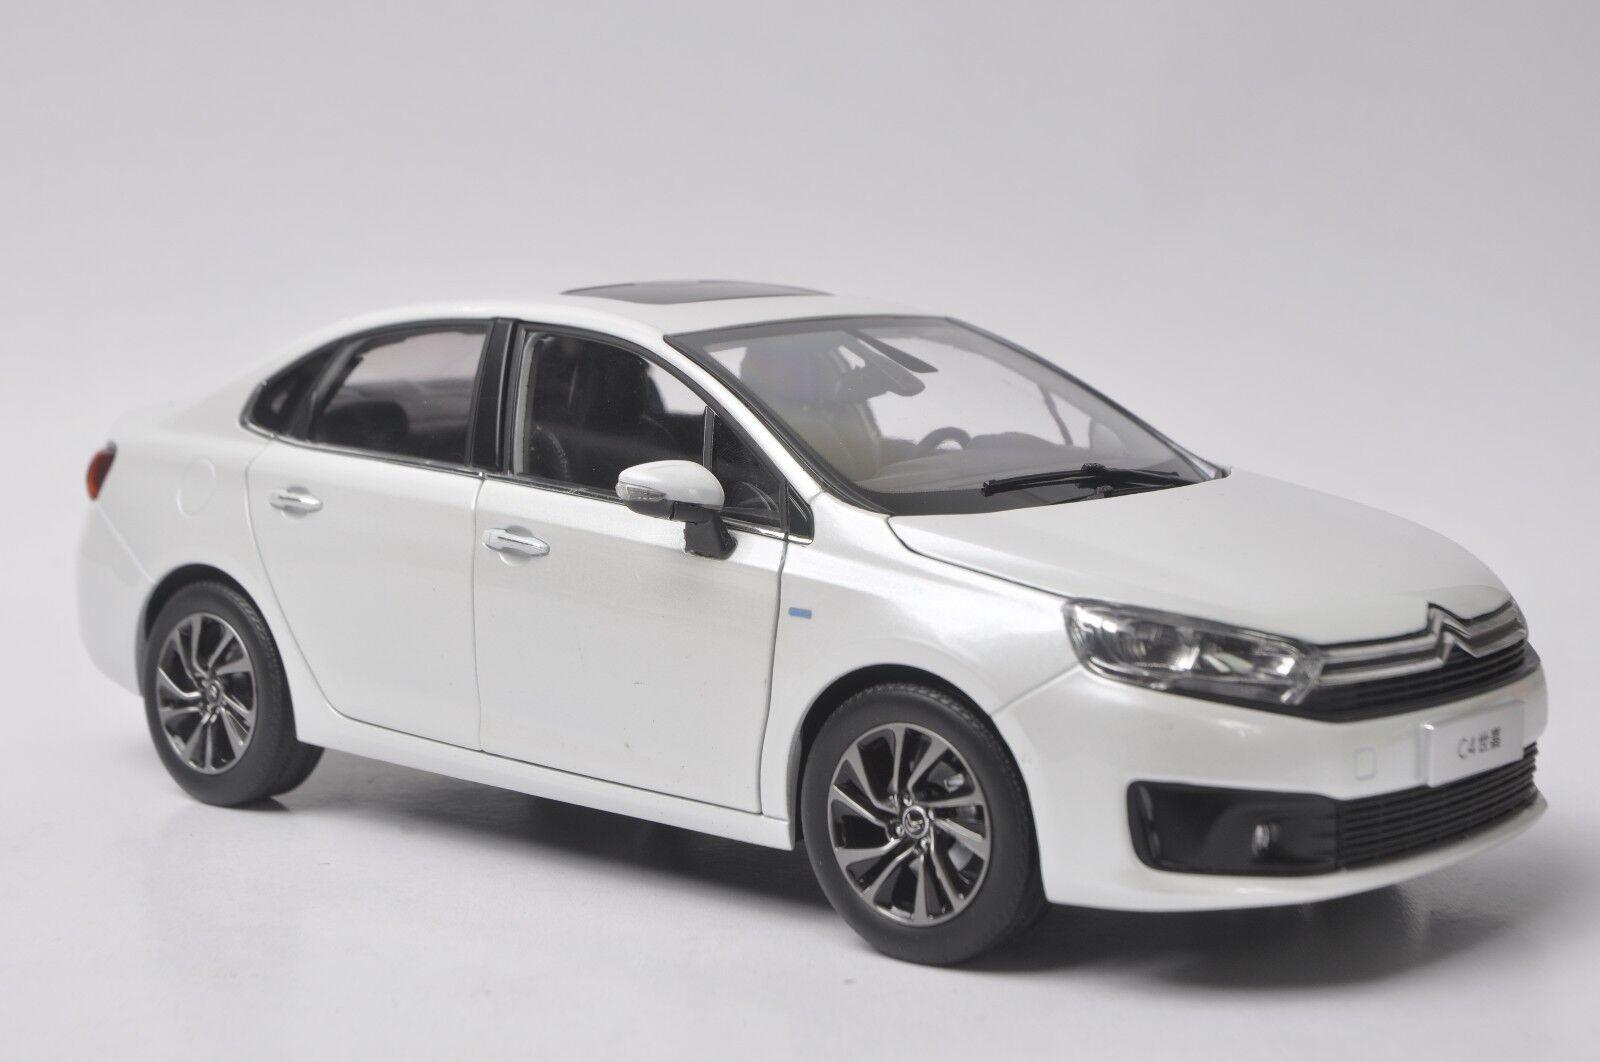 Citroen c4 2016 auto - modell im maßstab 1,18 Weiß